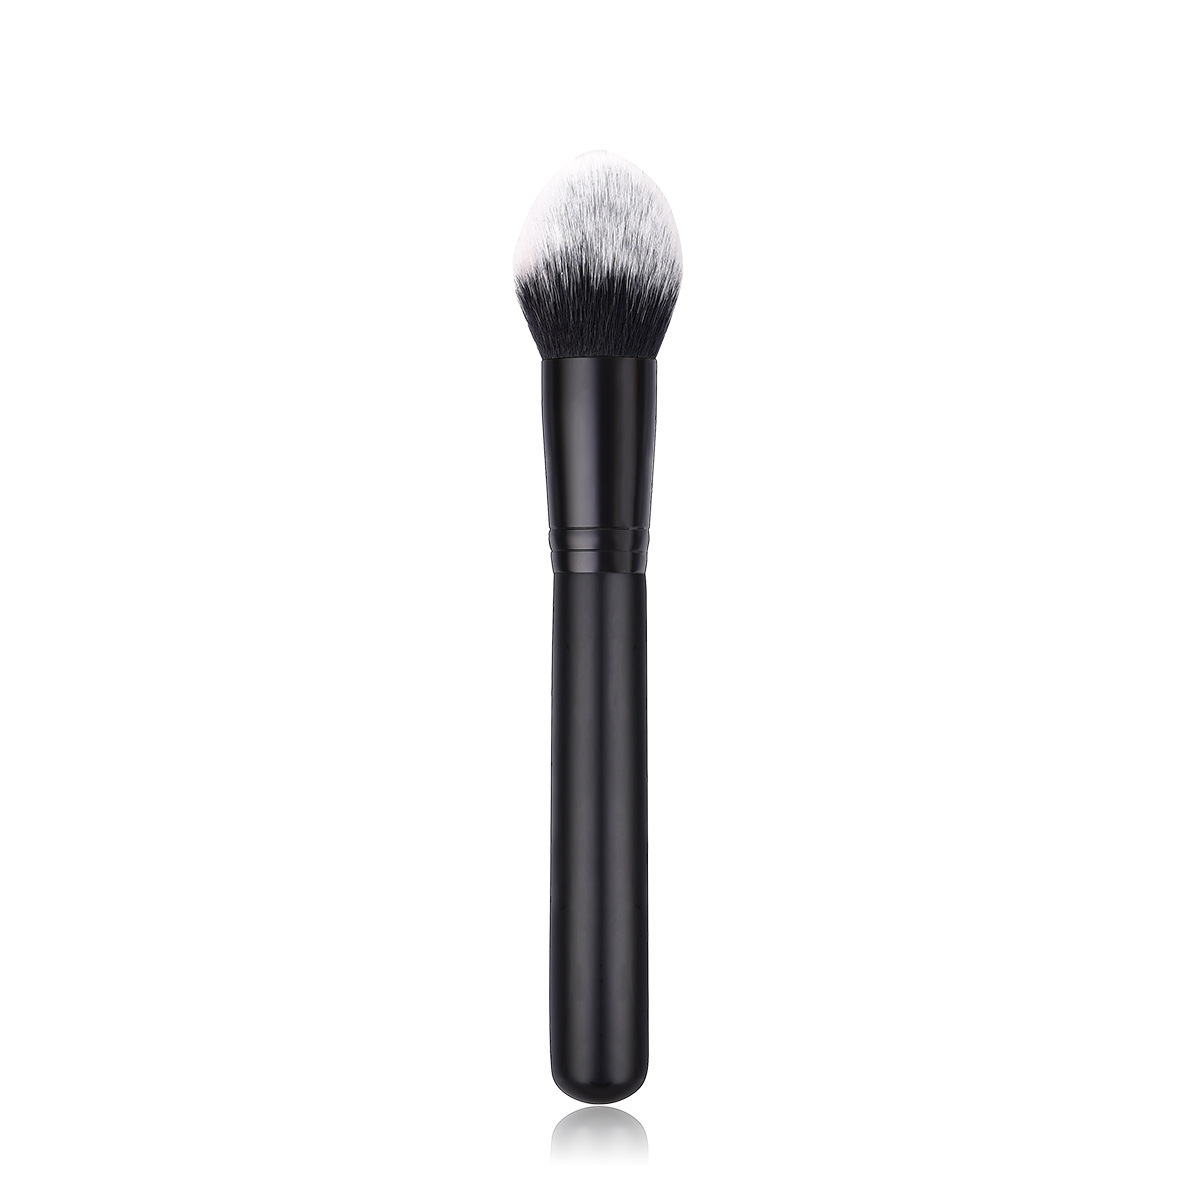 BBL 1Pcs Angled Double Ended Pro Contouring Sculpting Brush Multi-purpose Blender Powder Blush Makeup Brushes Cosmetic Tools 7